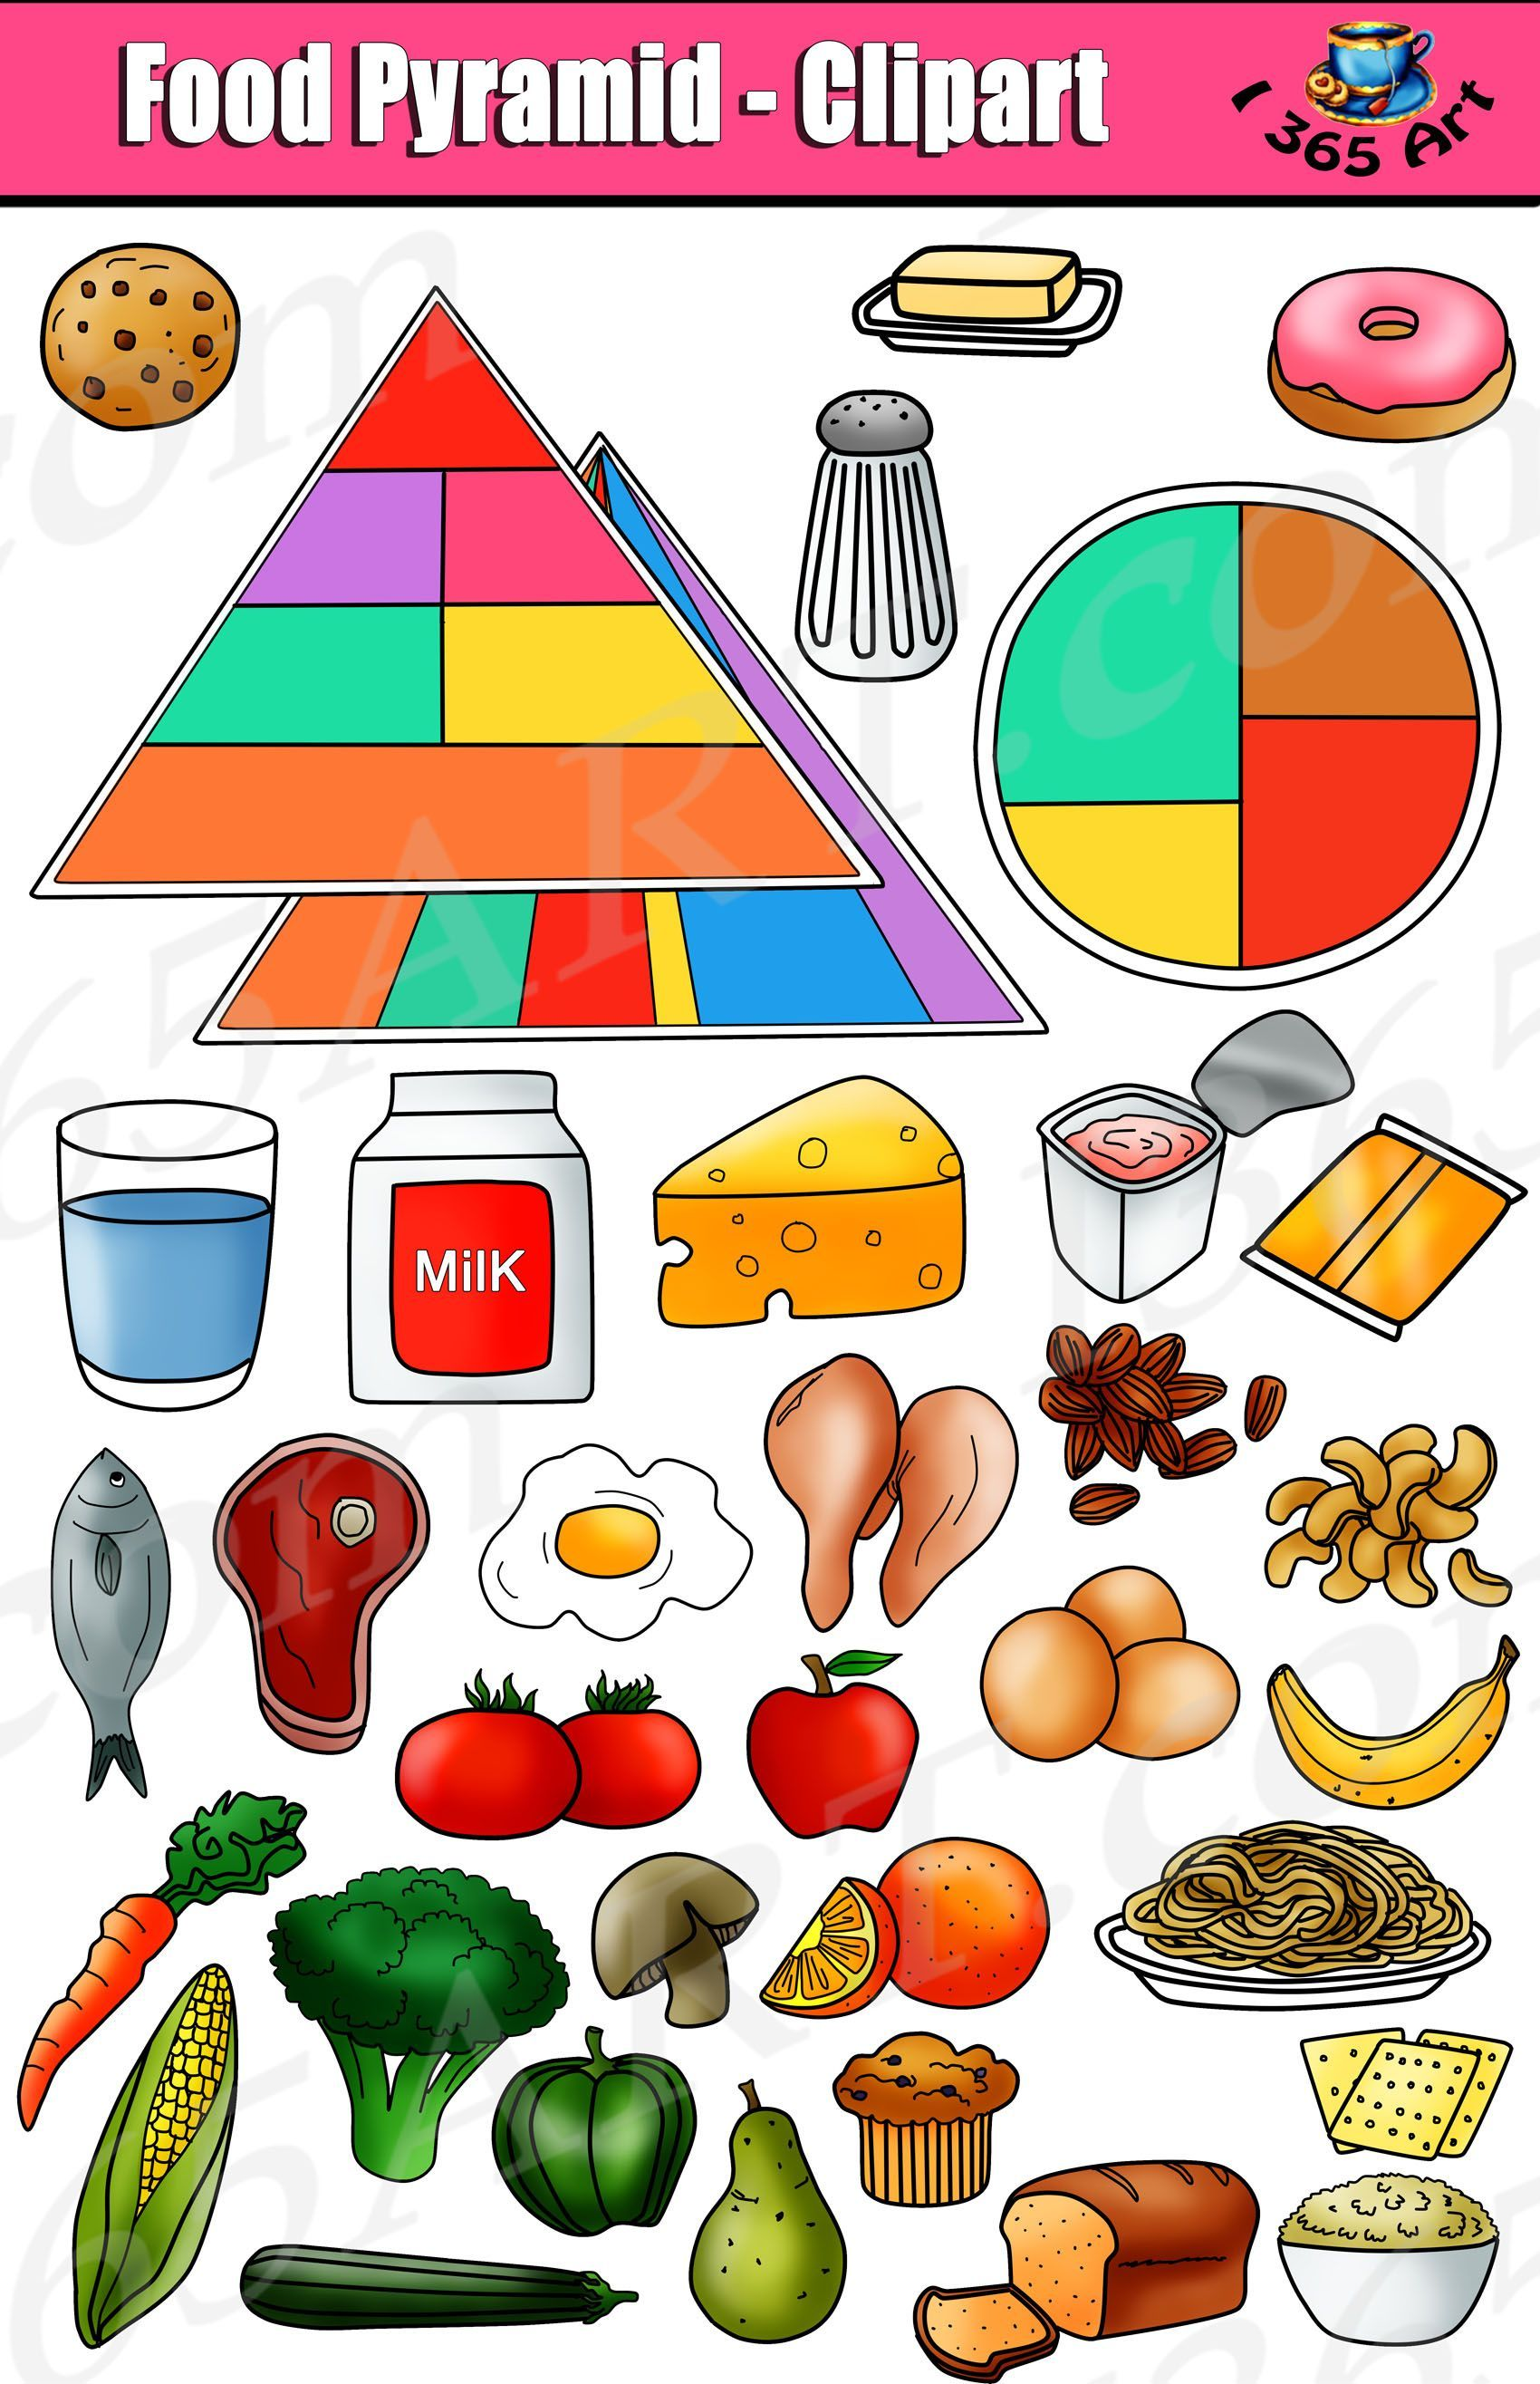 Healthy Kids Food Pyramid clipart graphics set